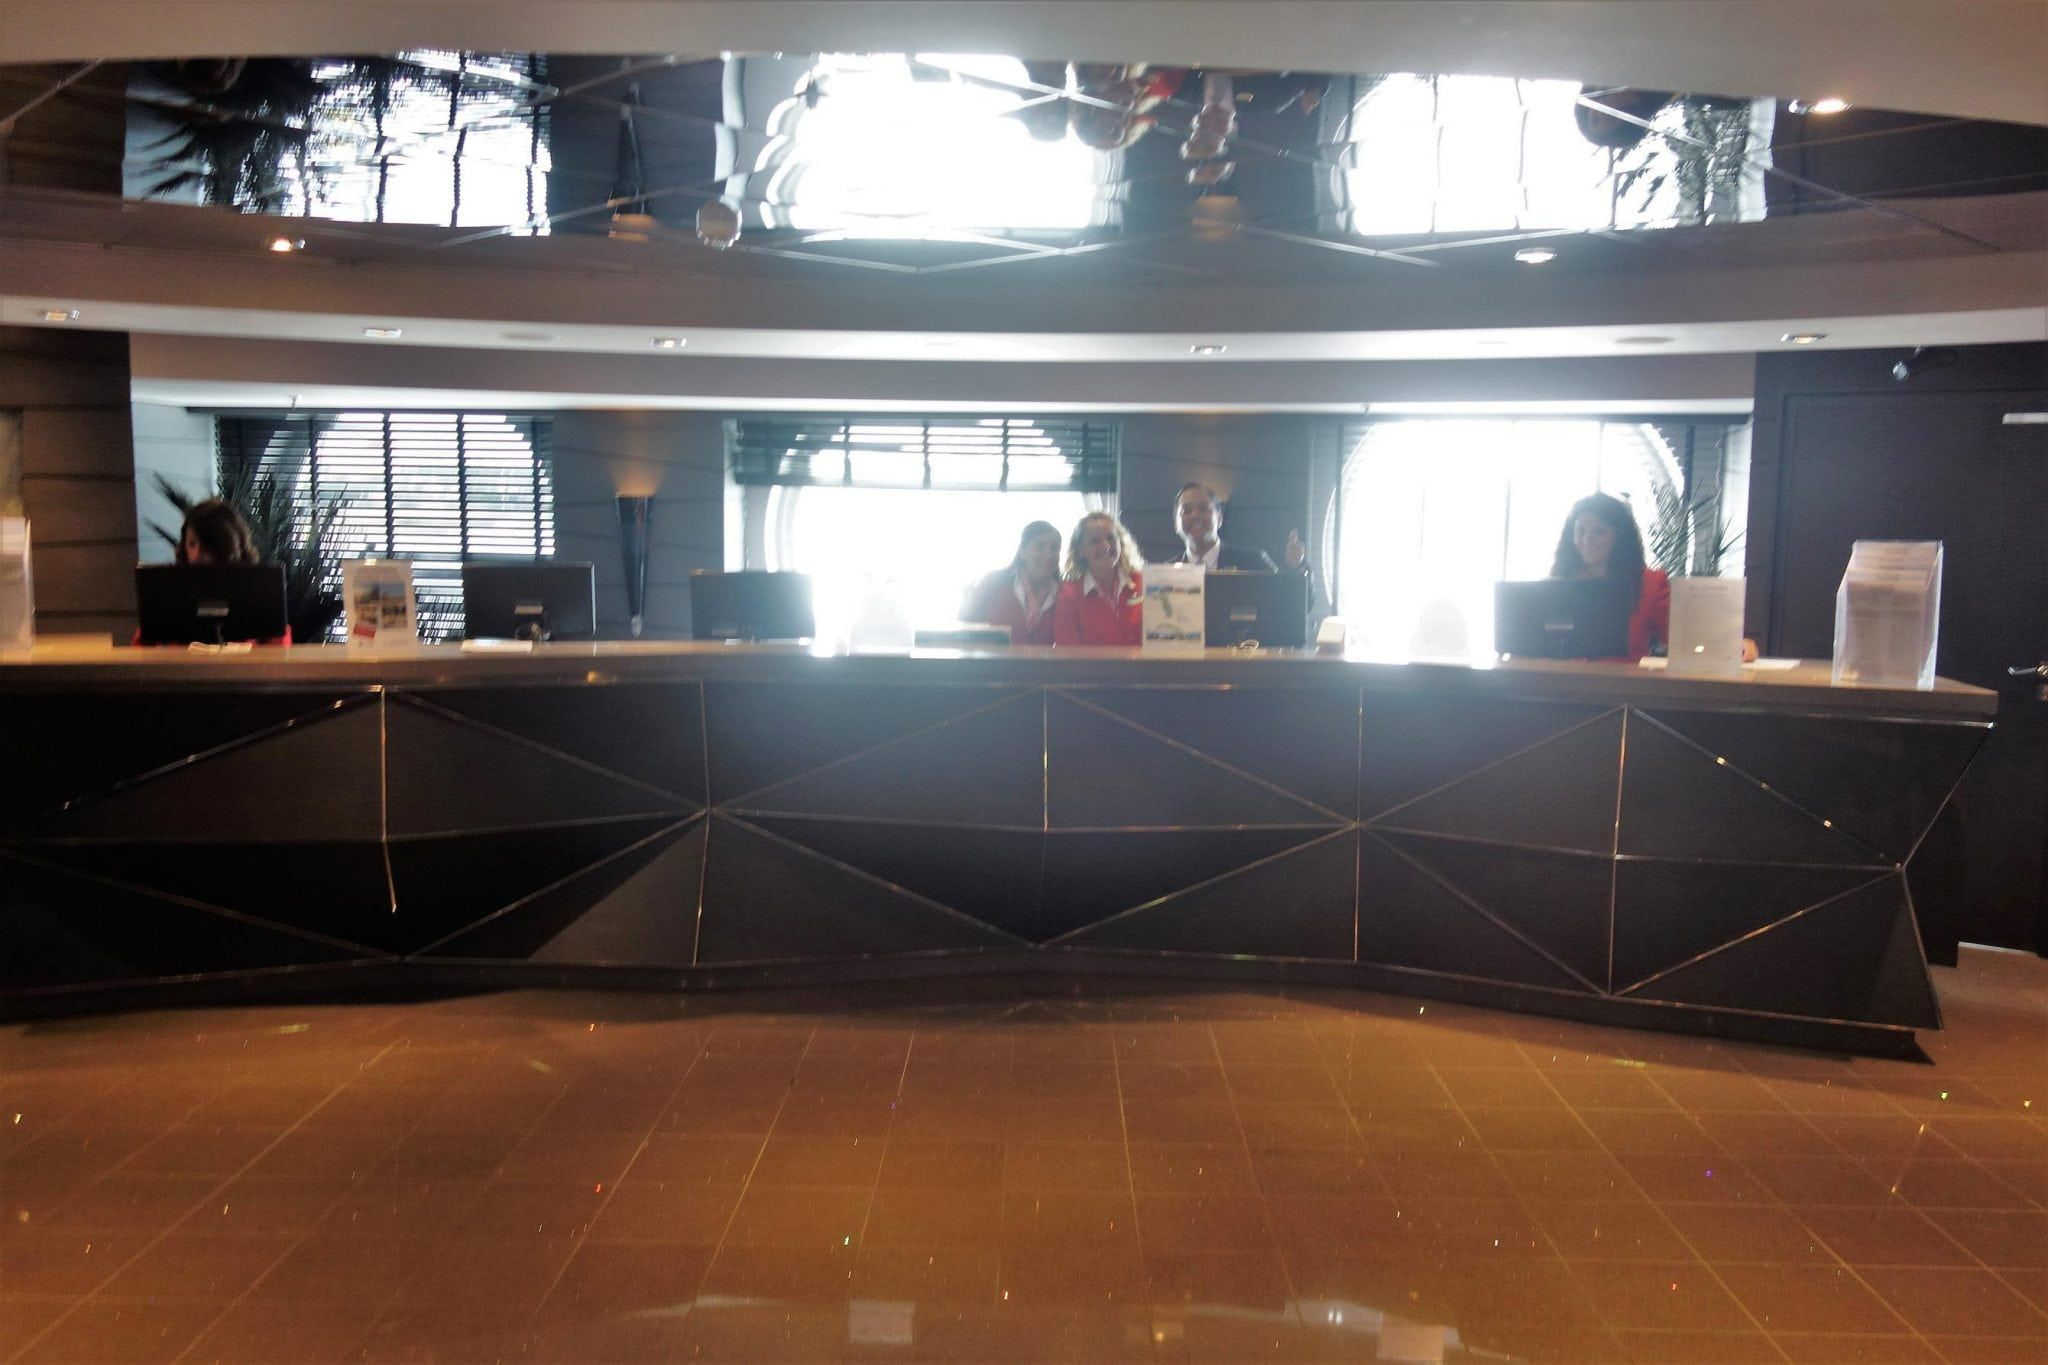 Top 10 Reasons to Take an MSC Divina Cruise